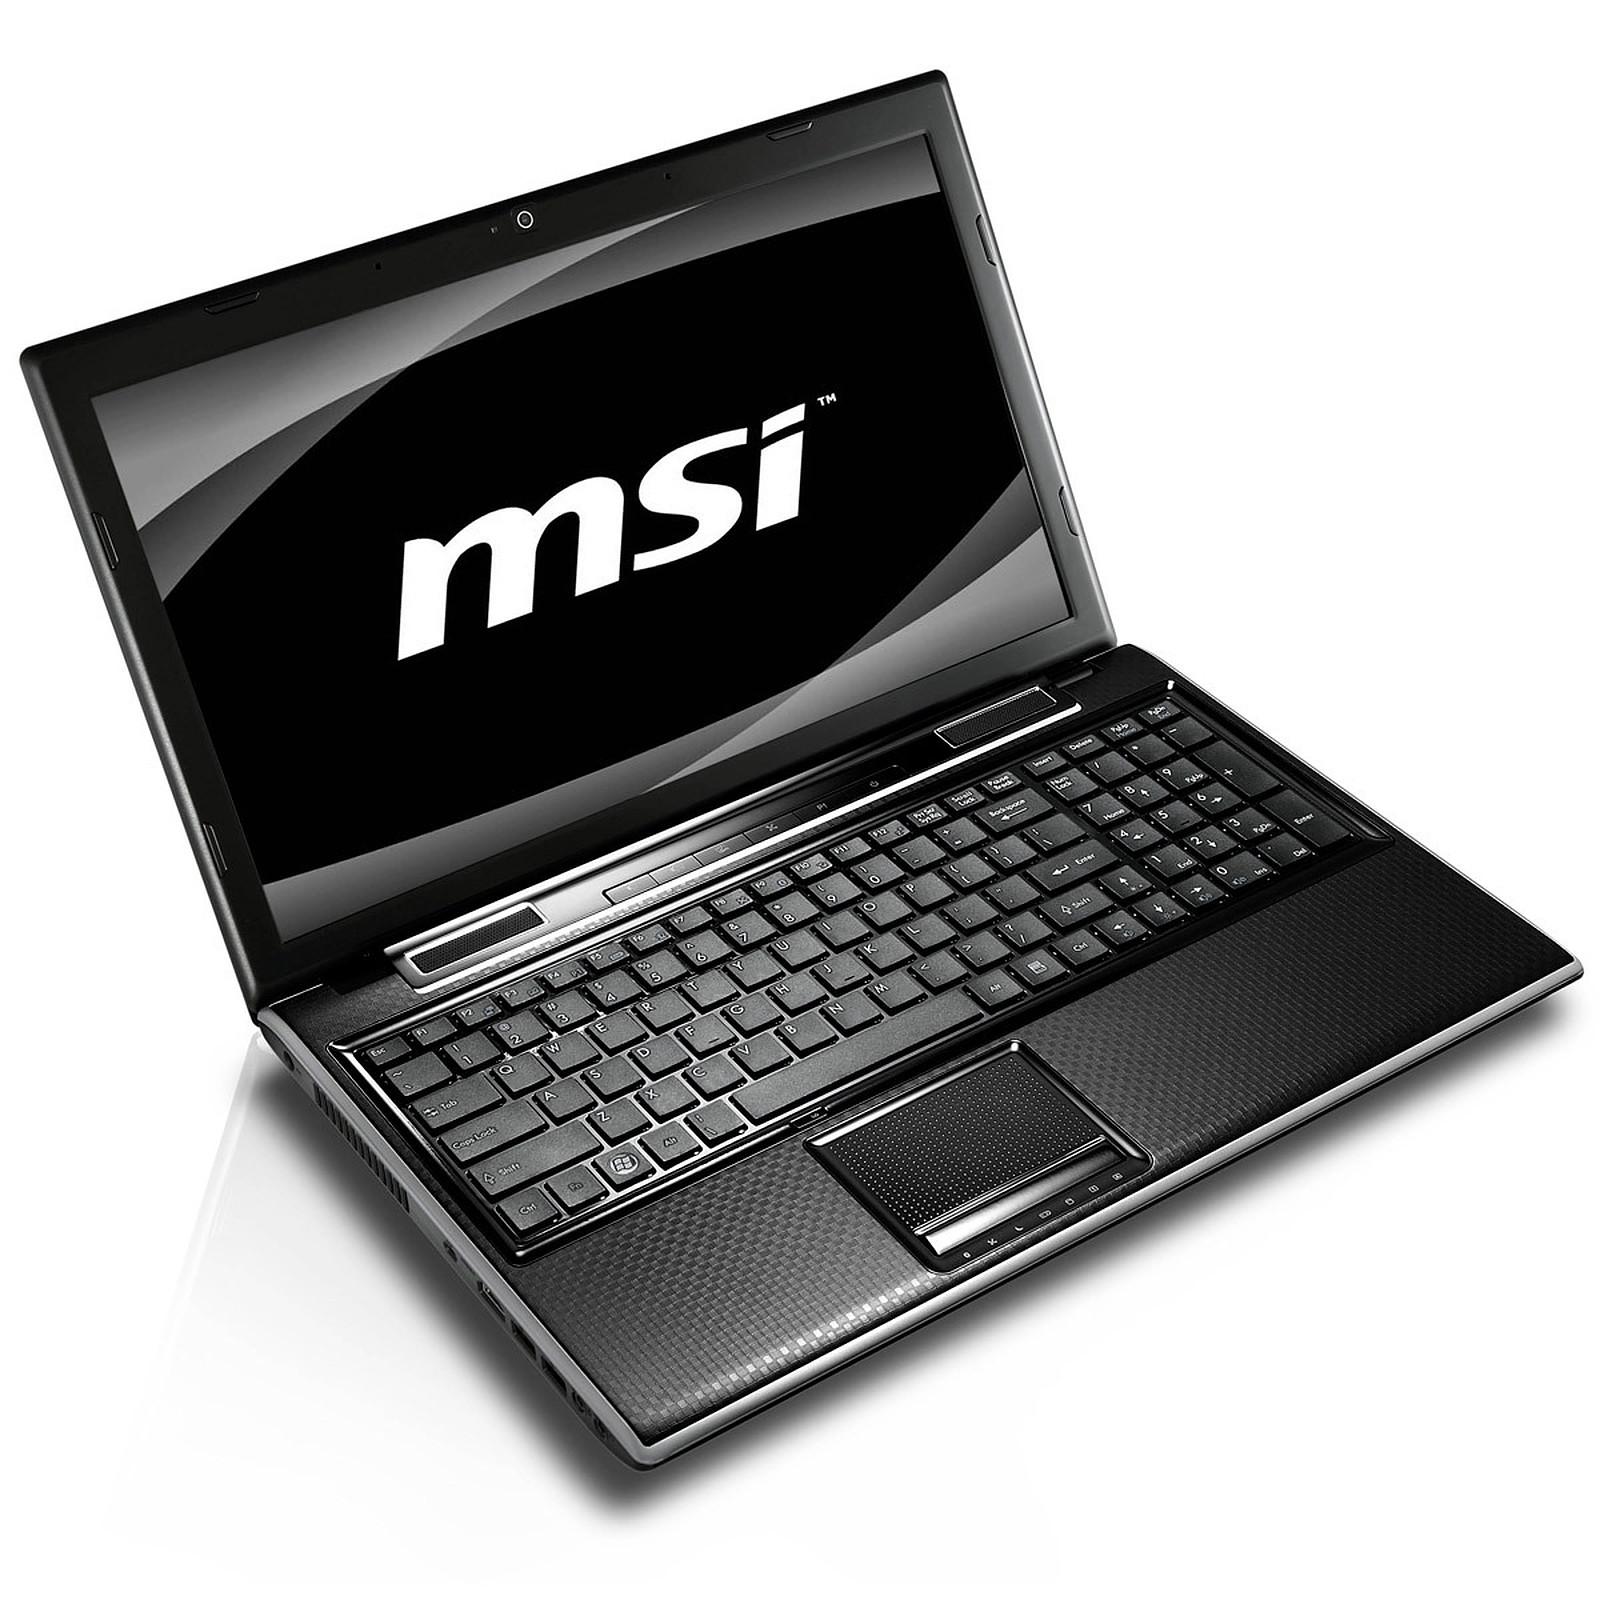 MSI FX600MX-008